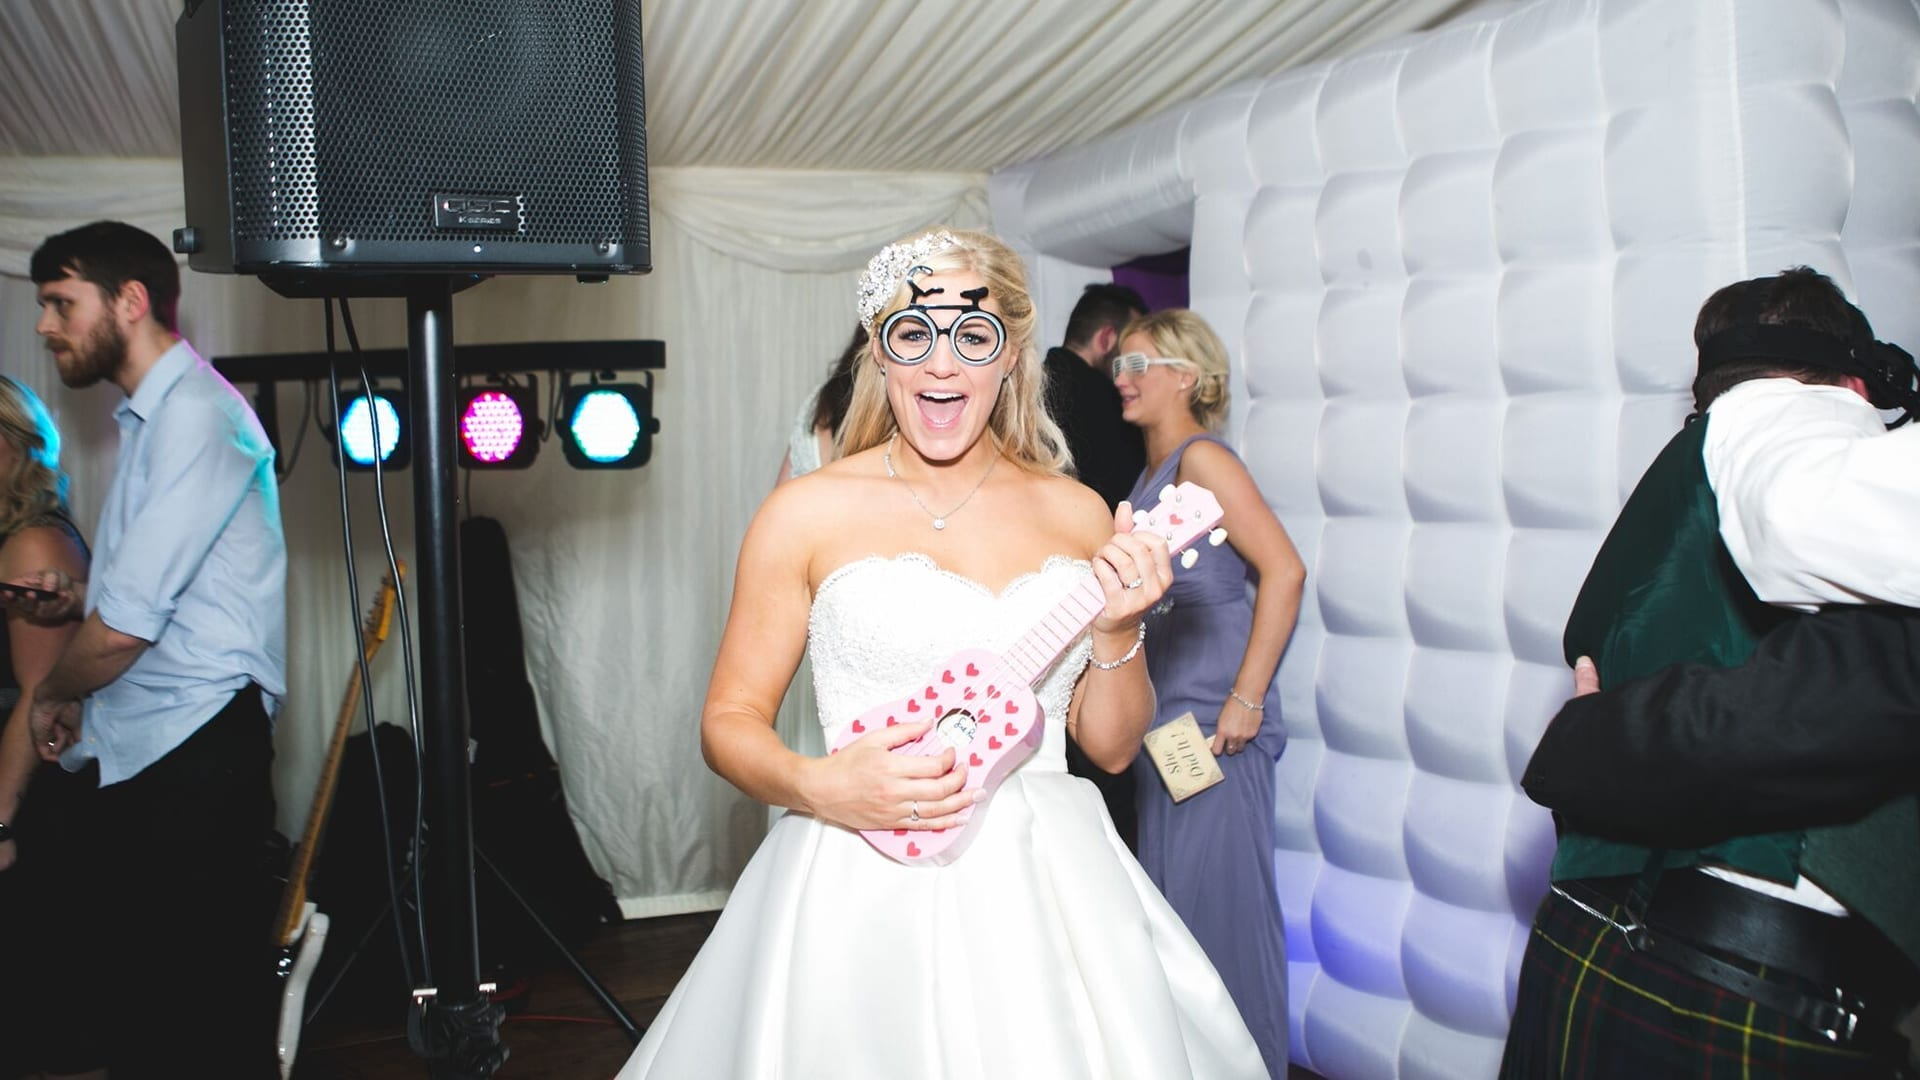 Bride enjoying reception at Barony Castle